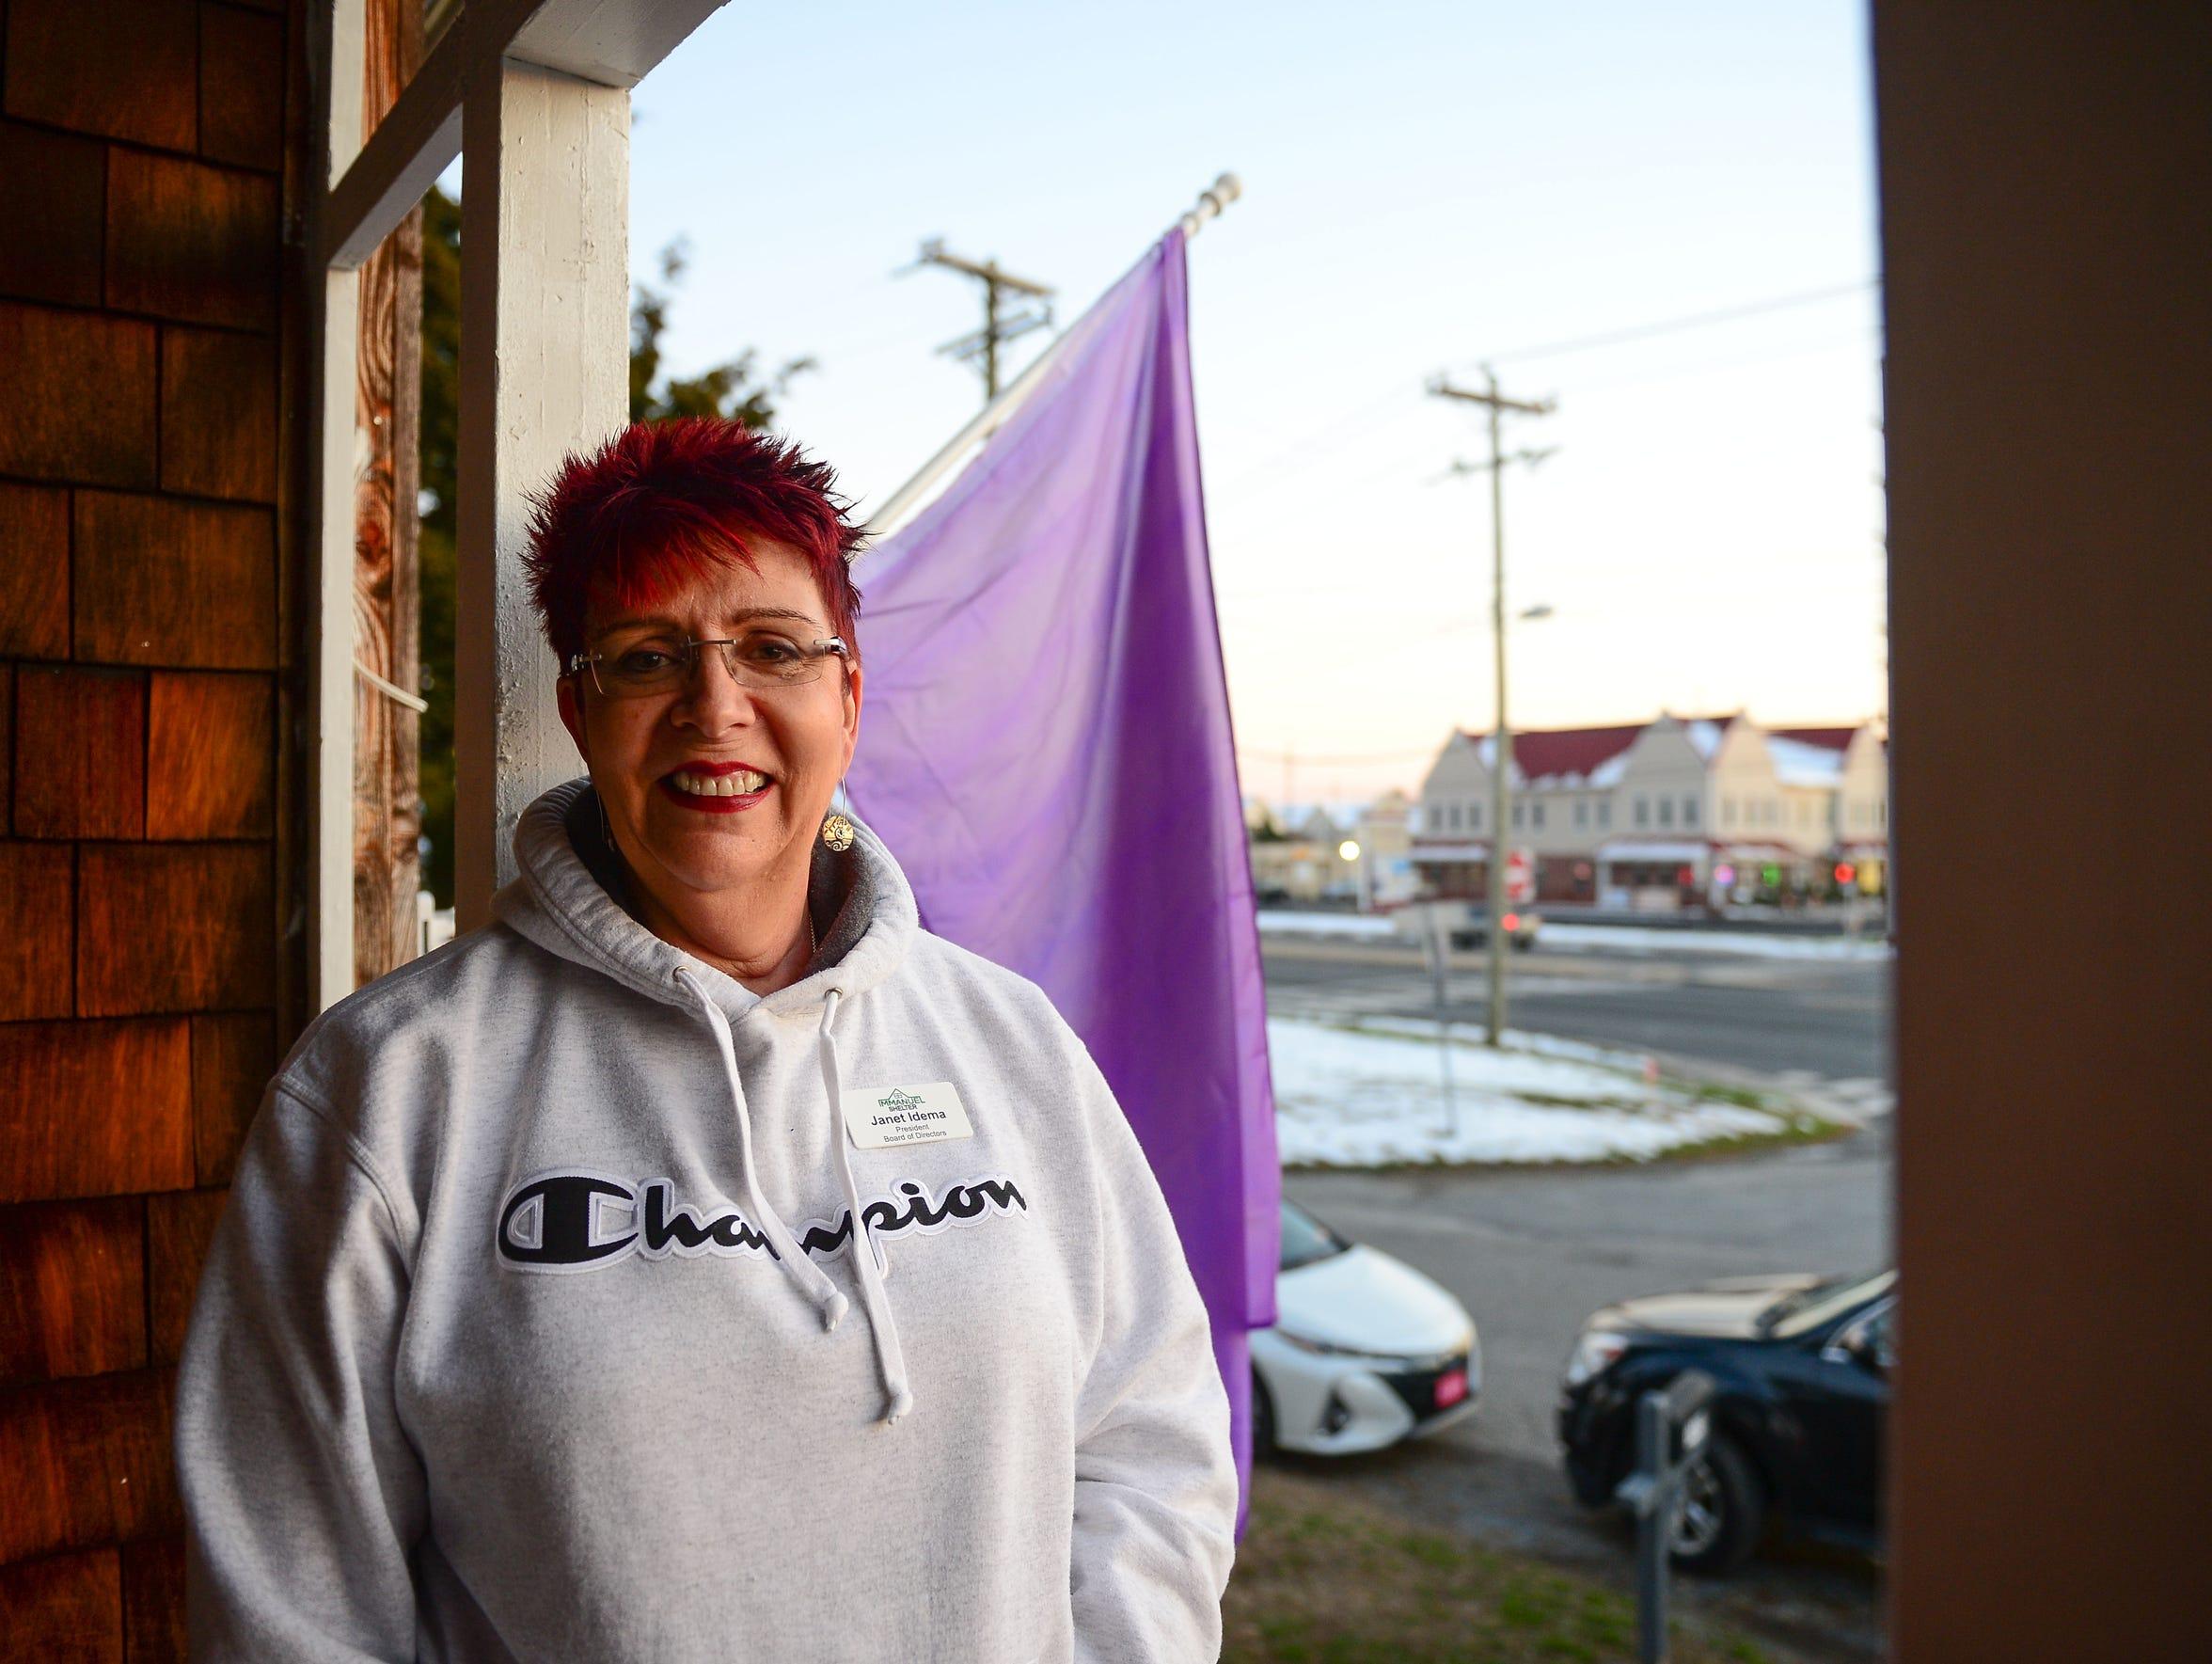 Janet Idema, Board of Directors, The Immanuel Shelter